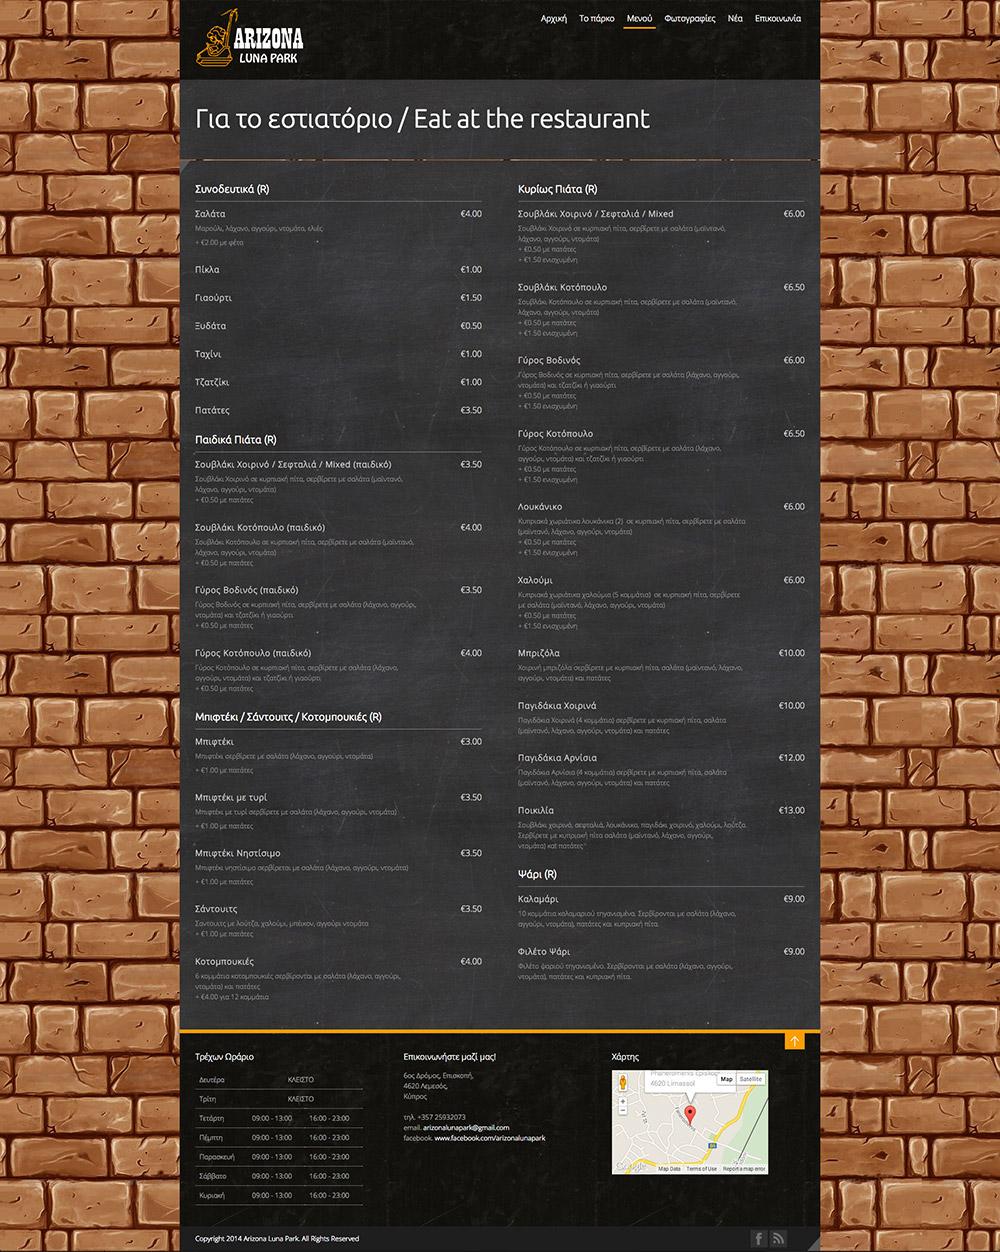 pricelist-page